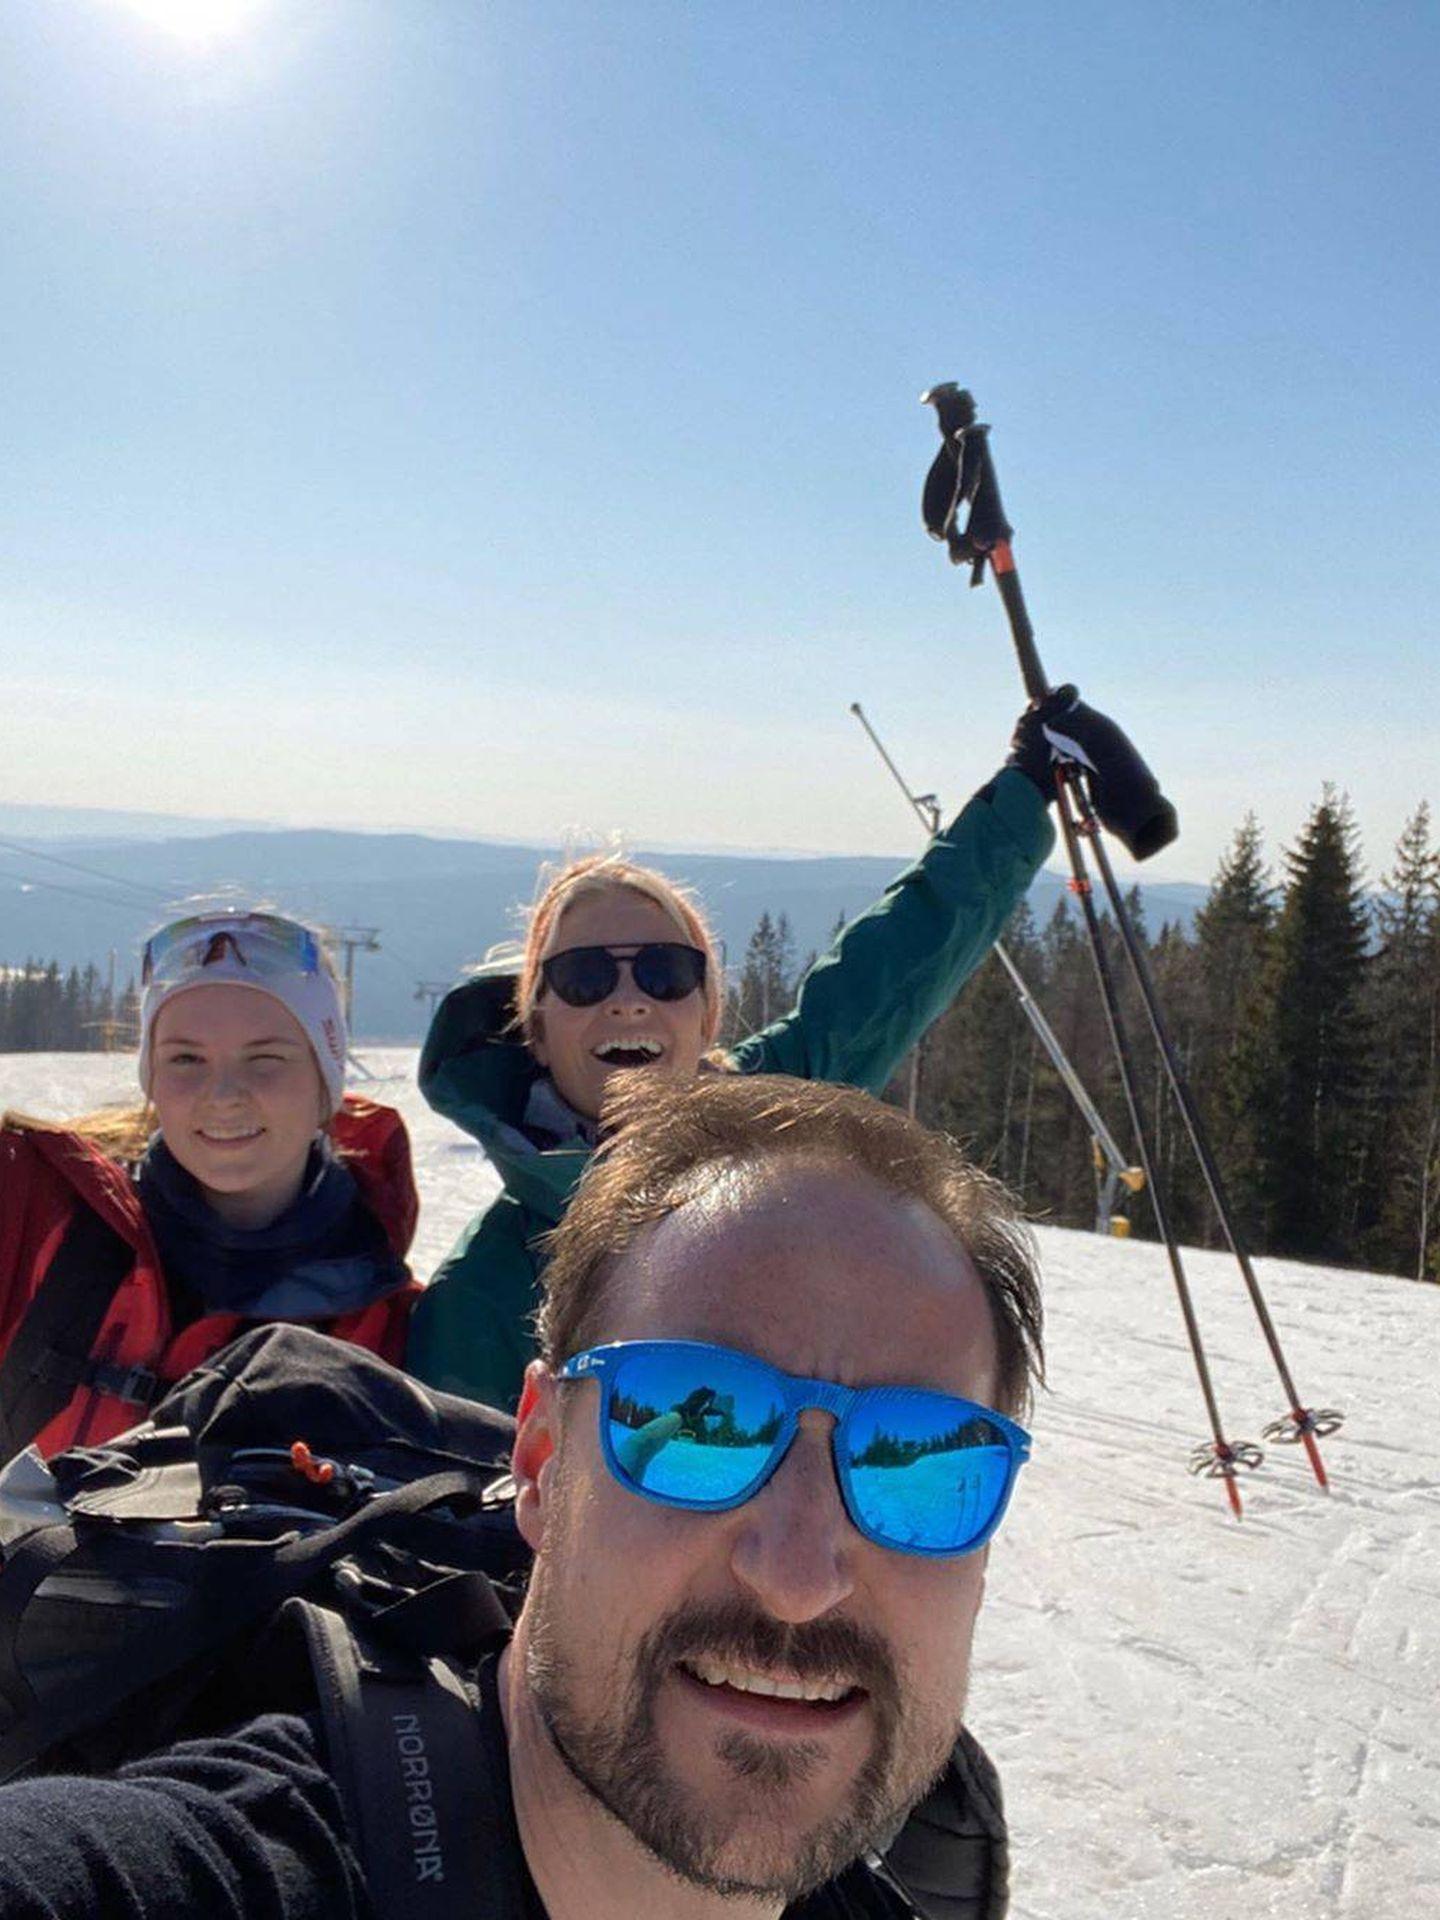 Haakon, Mette-Marit e Ingrid Alexandra. (@crownprincessmm)